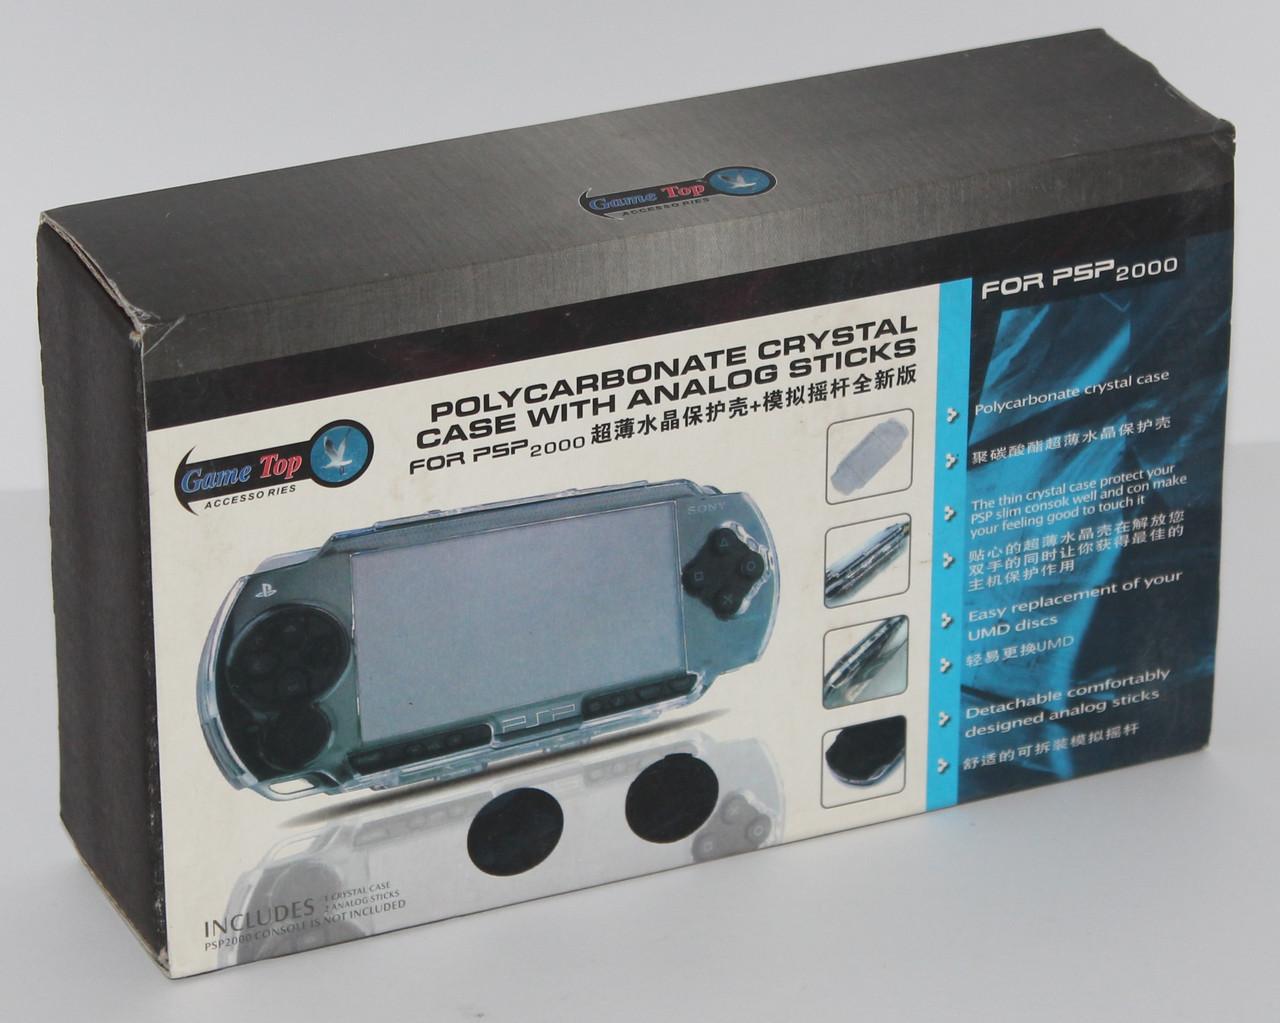 Чохол Polycarbonate Crystal Case with Analog Sticks for PSP 2000/Slim